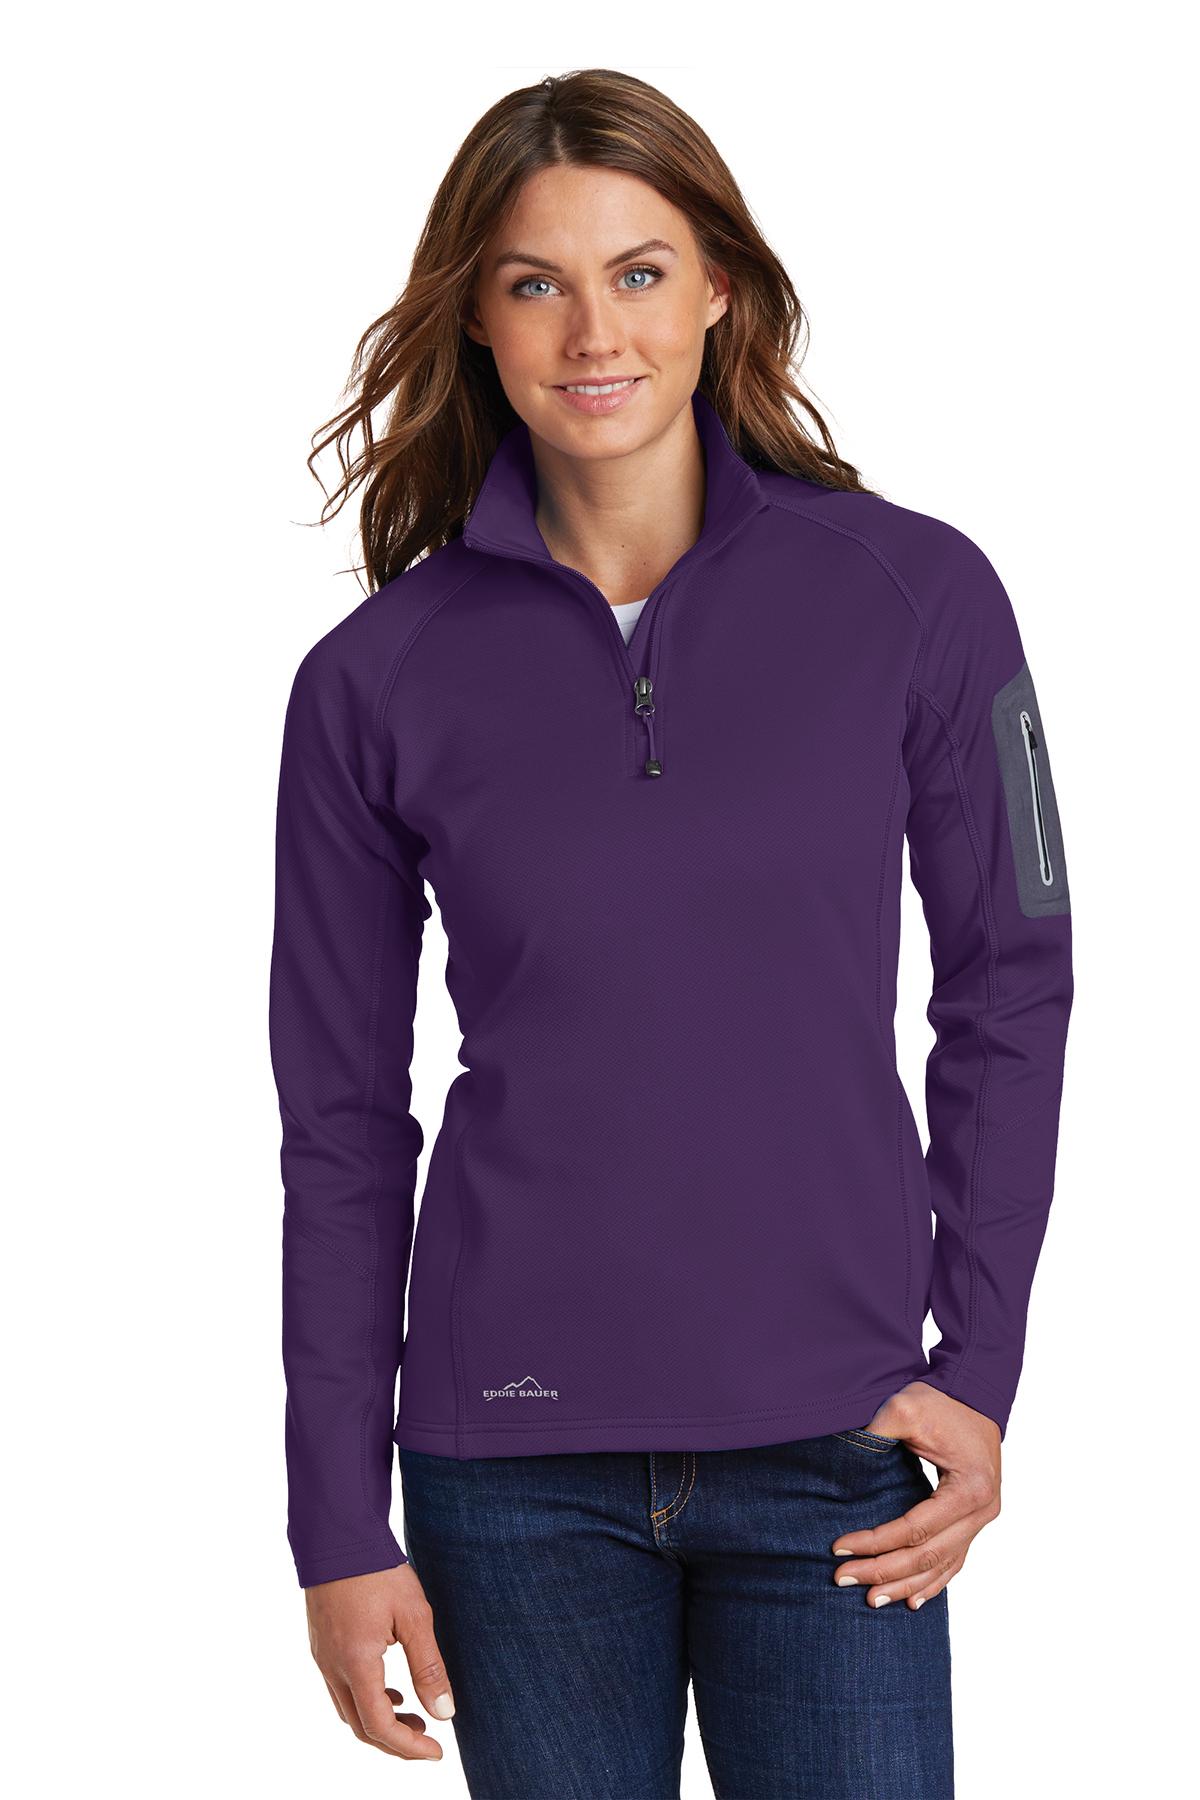 f4e1c038411 Eddie Bauer® Ladies 1/2-Zip Performance Fleece | Ladies/Women ...